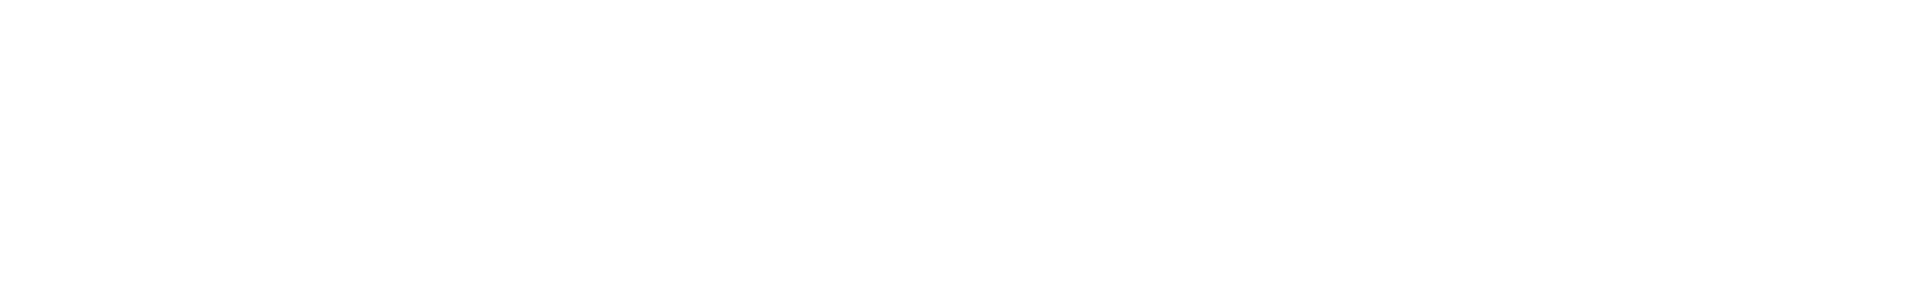 Design a Logo for a Venture Capital Fund by Almi design ...